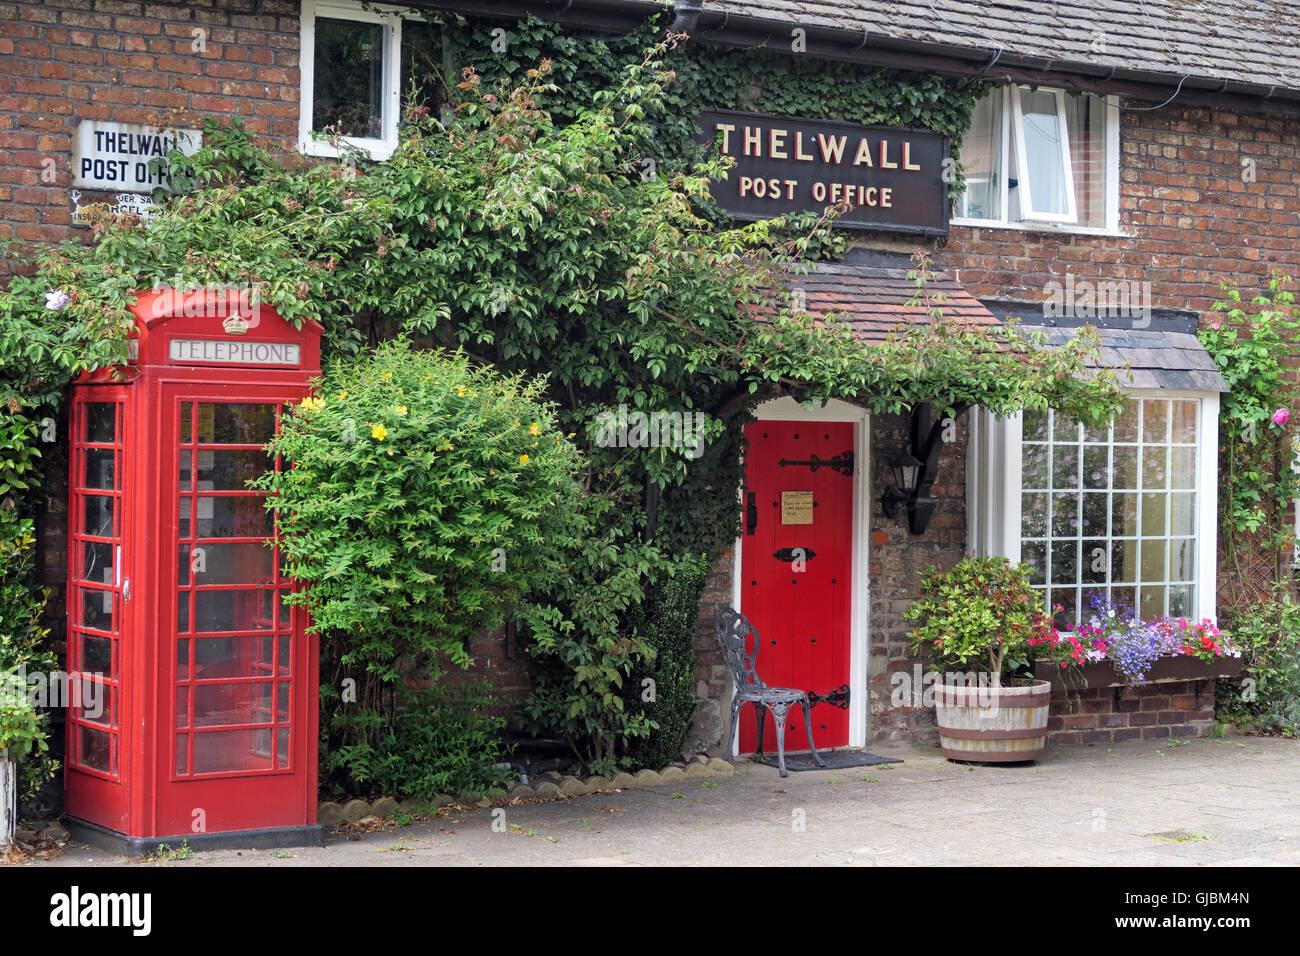 Laden Sie dieses Alamy Stockfoto Alte Post, Bell Lane, Thelwalls, Warrington, Cheshire, England, UK - GJBM4N